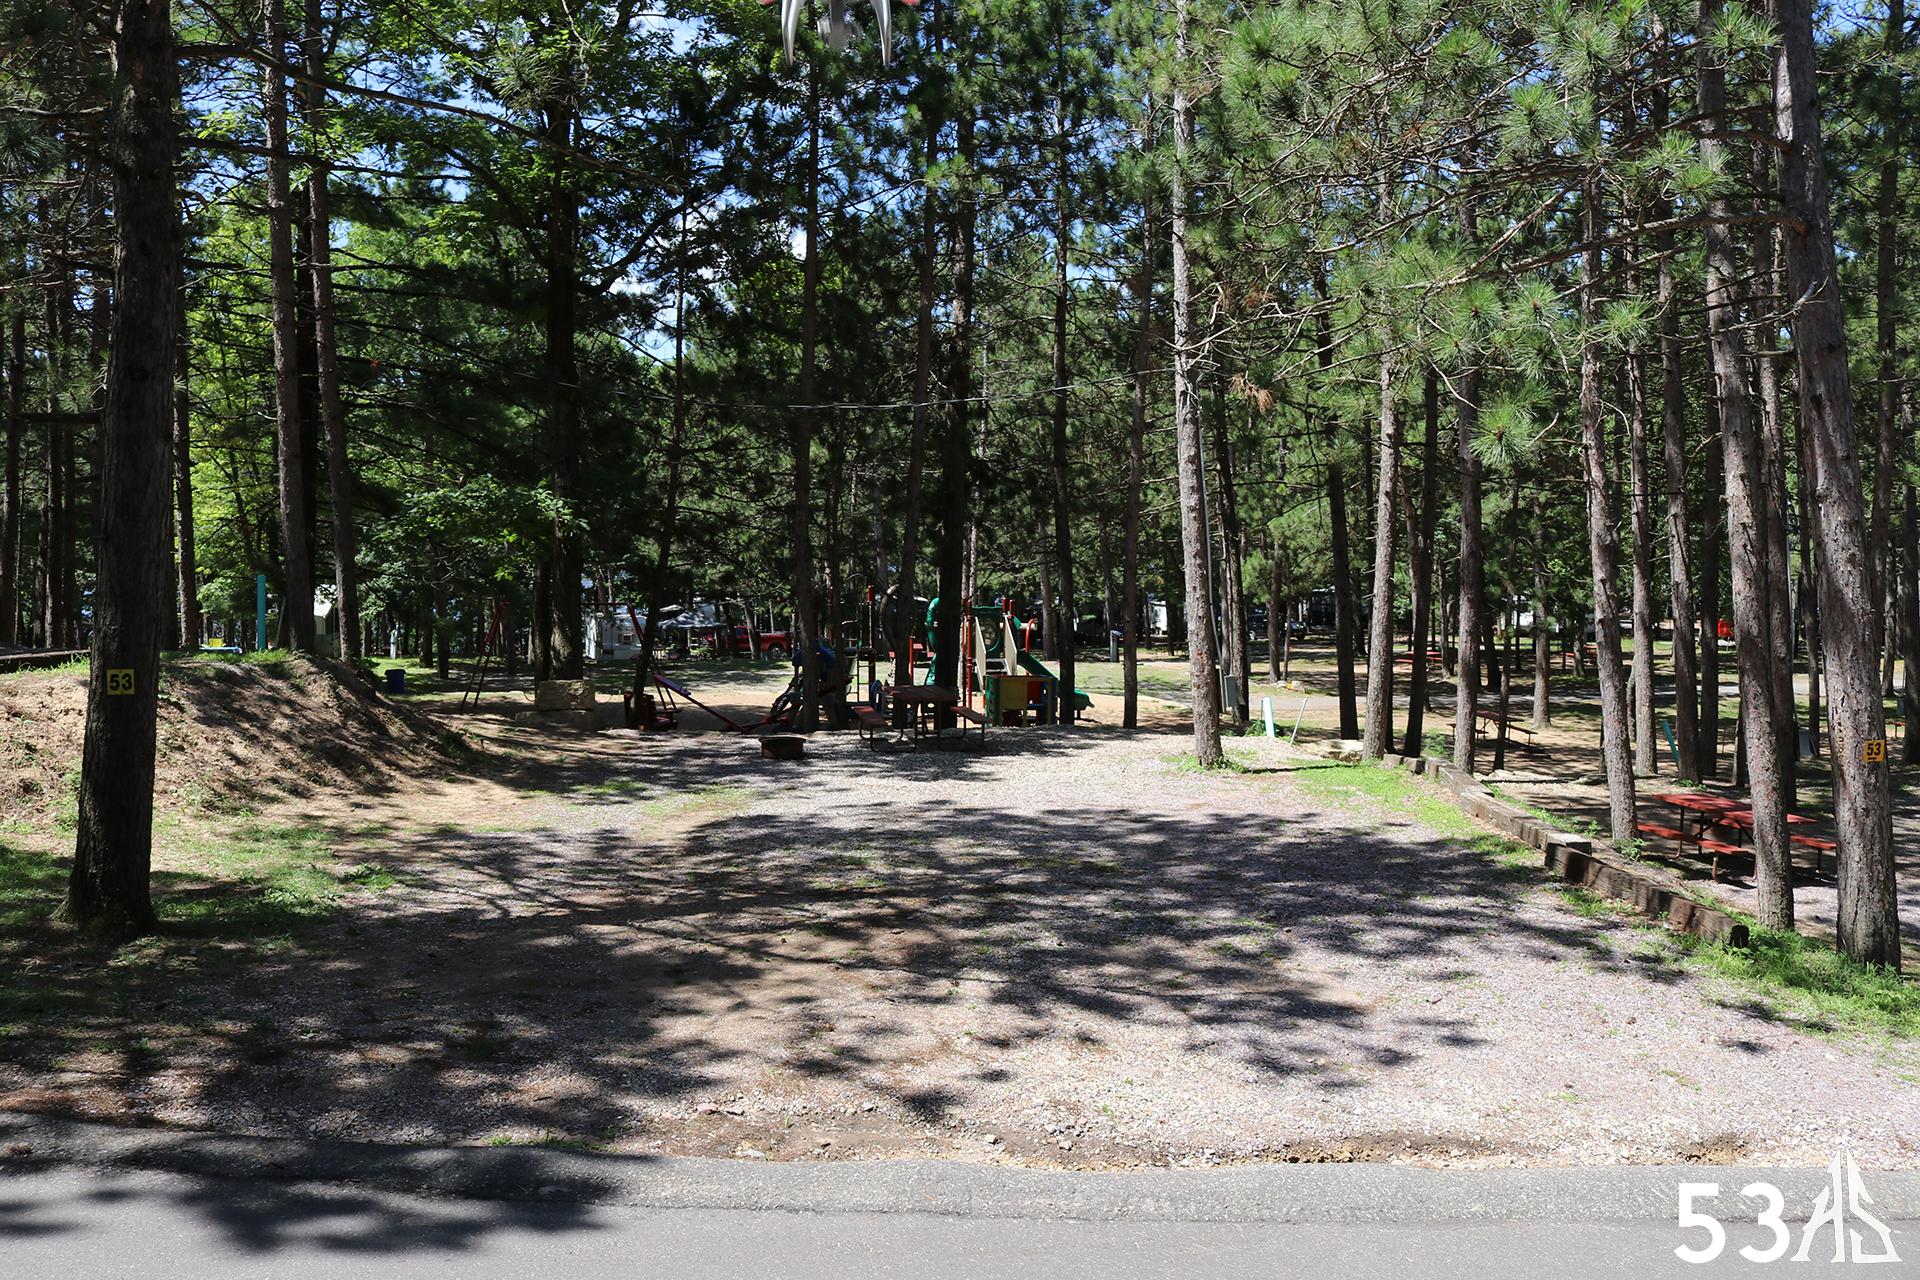 Campsite 53 - Holiday Shores, Wisconsin Dells, Camping ...